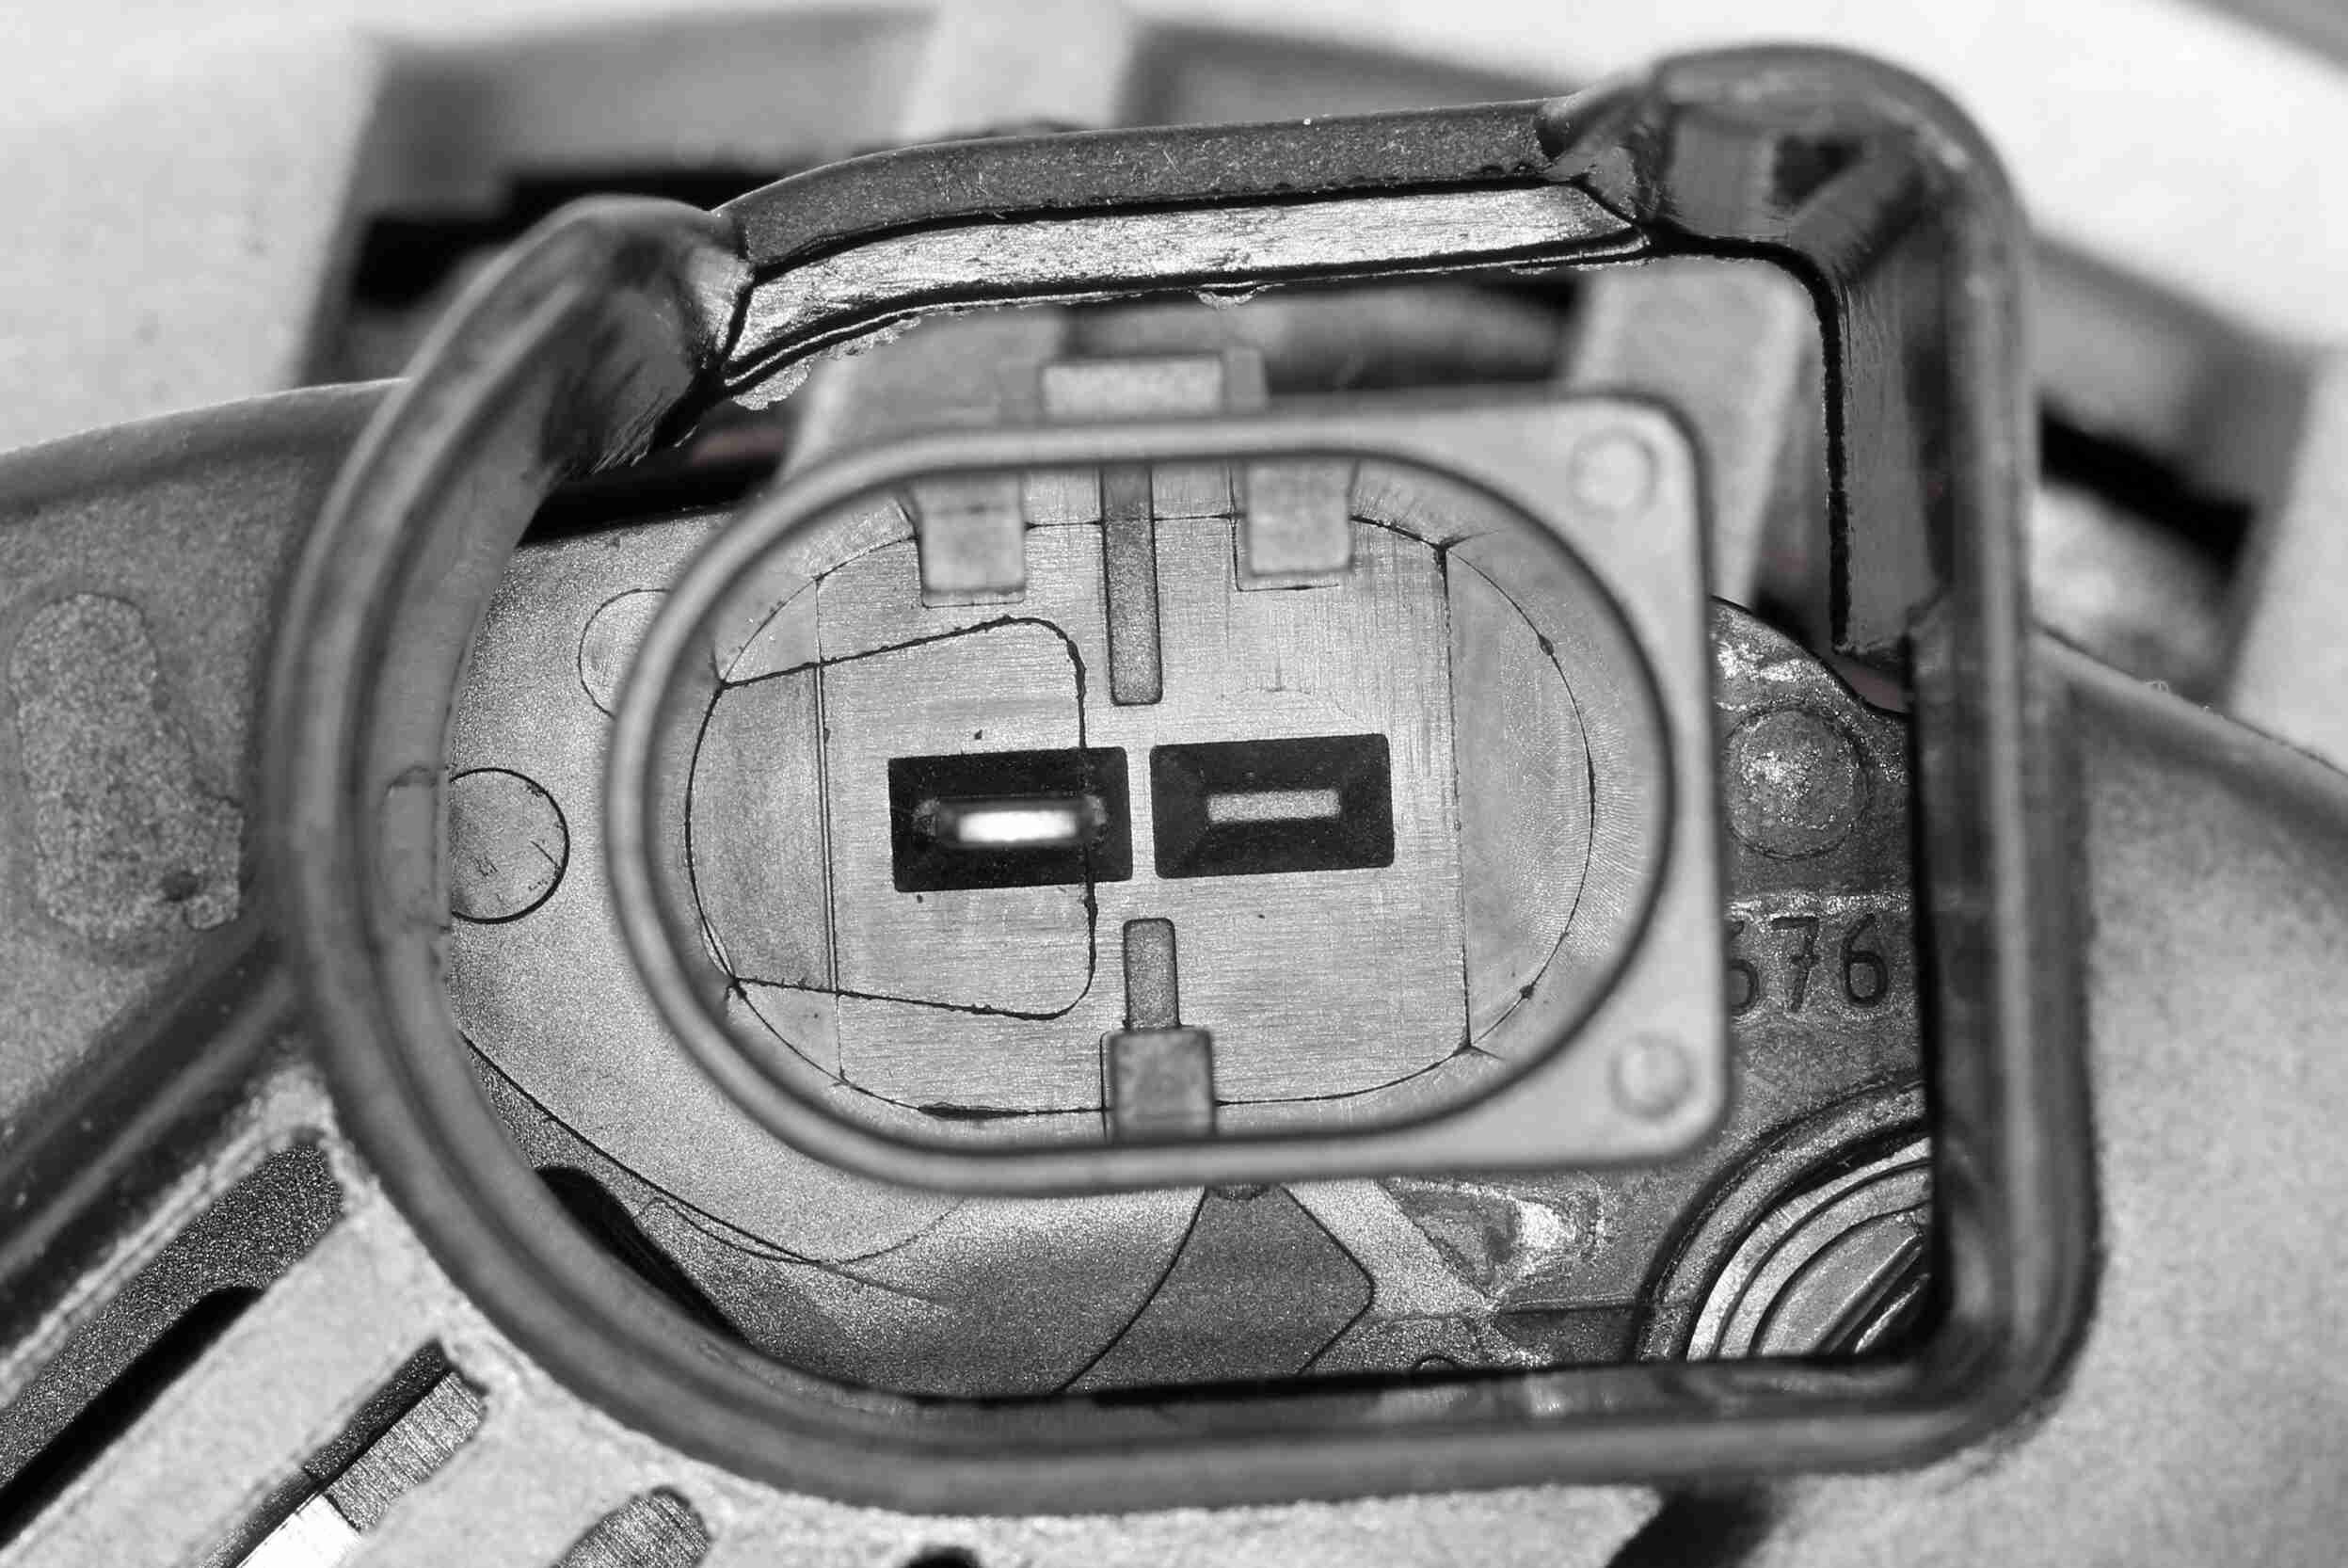 Generator VEMO V30-13-50011 Bewertung